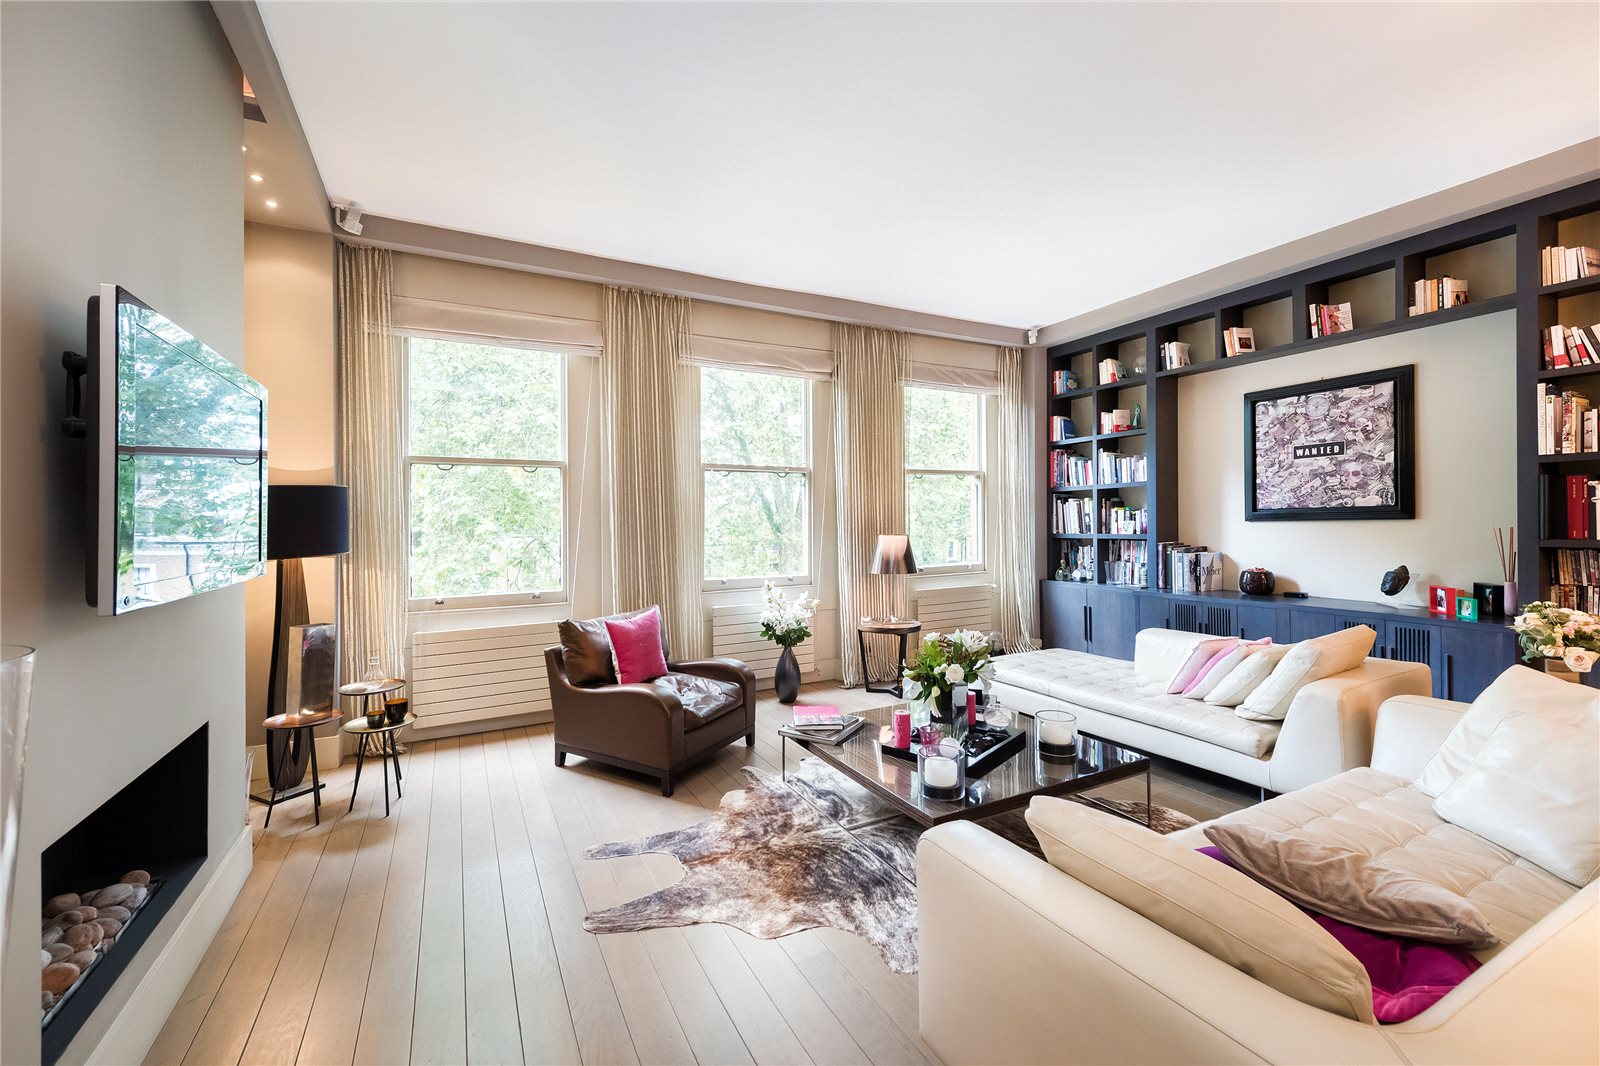 Apartments / Residences for Sale at Harrington Gardens, South Kensington, London, SW7 South Kensington, London, England